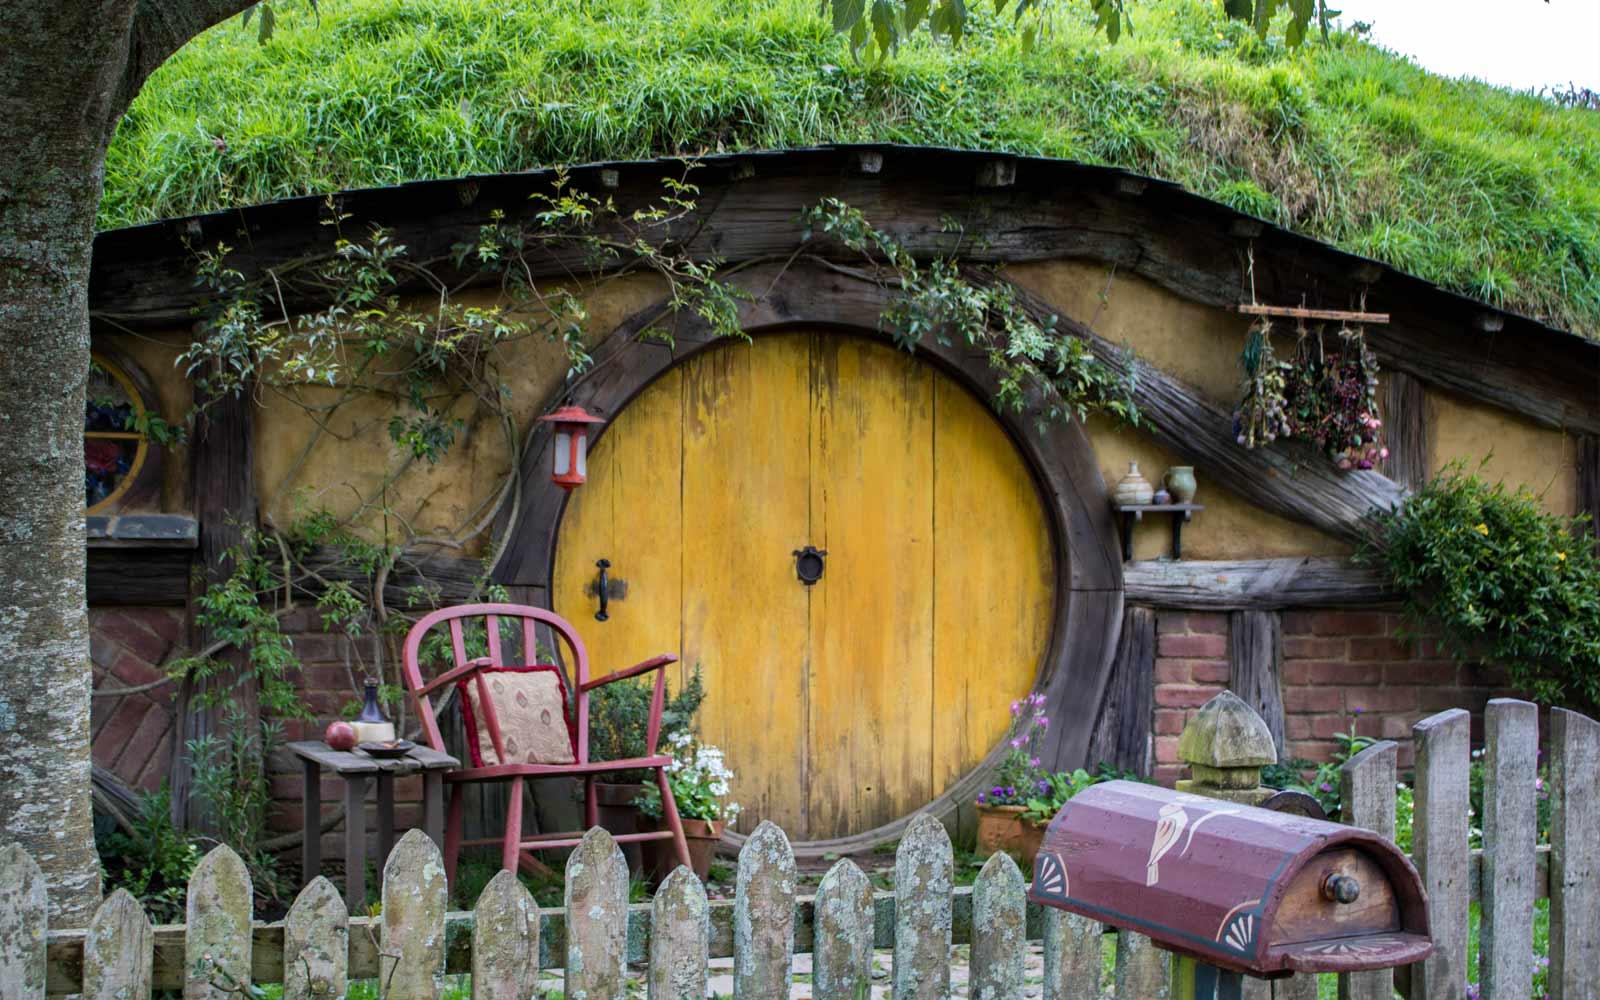 Hobbithöhle in Hobbiton